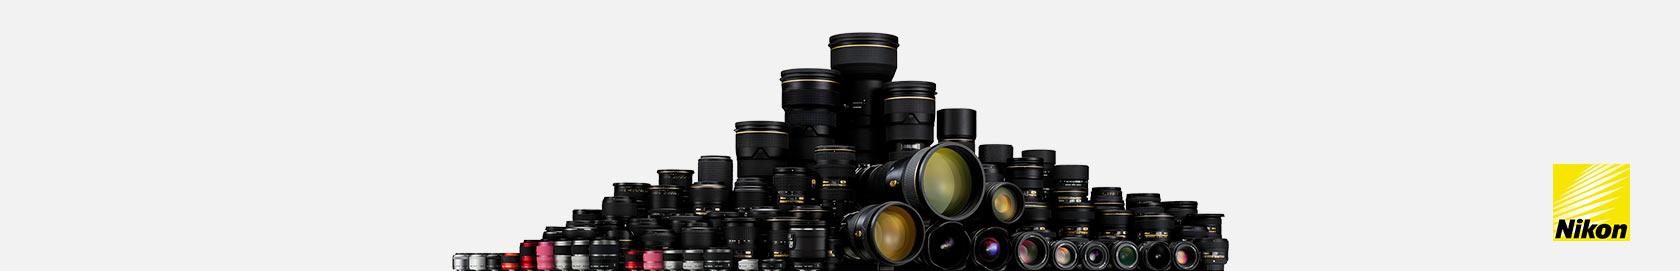 Nikon F DX